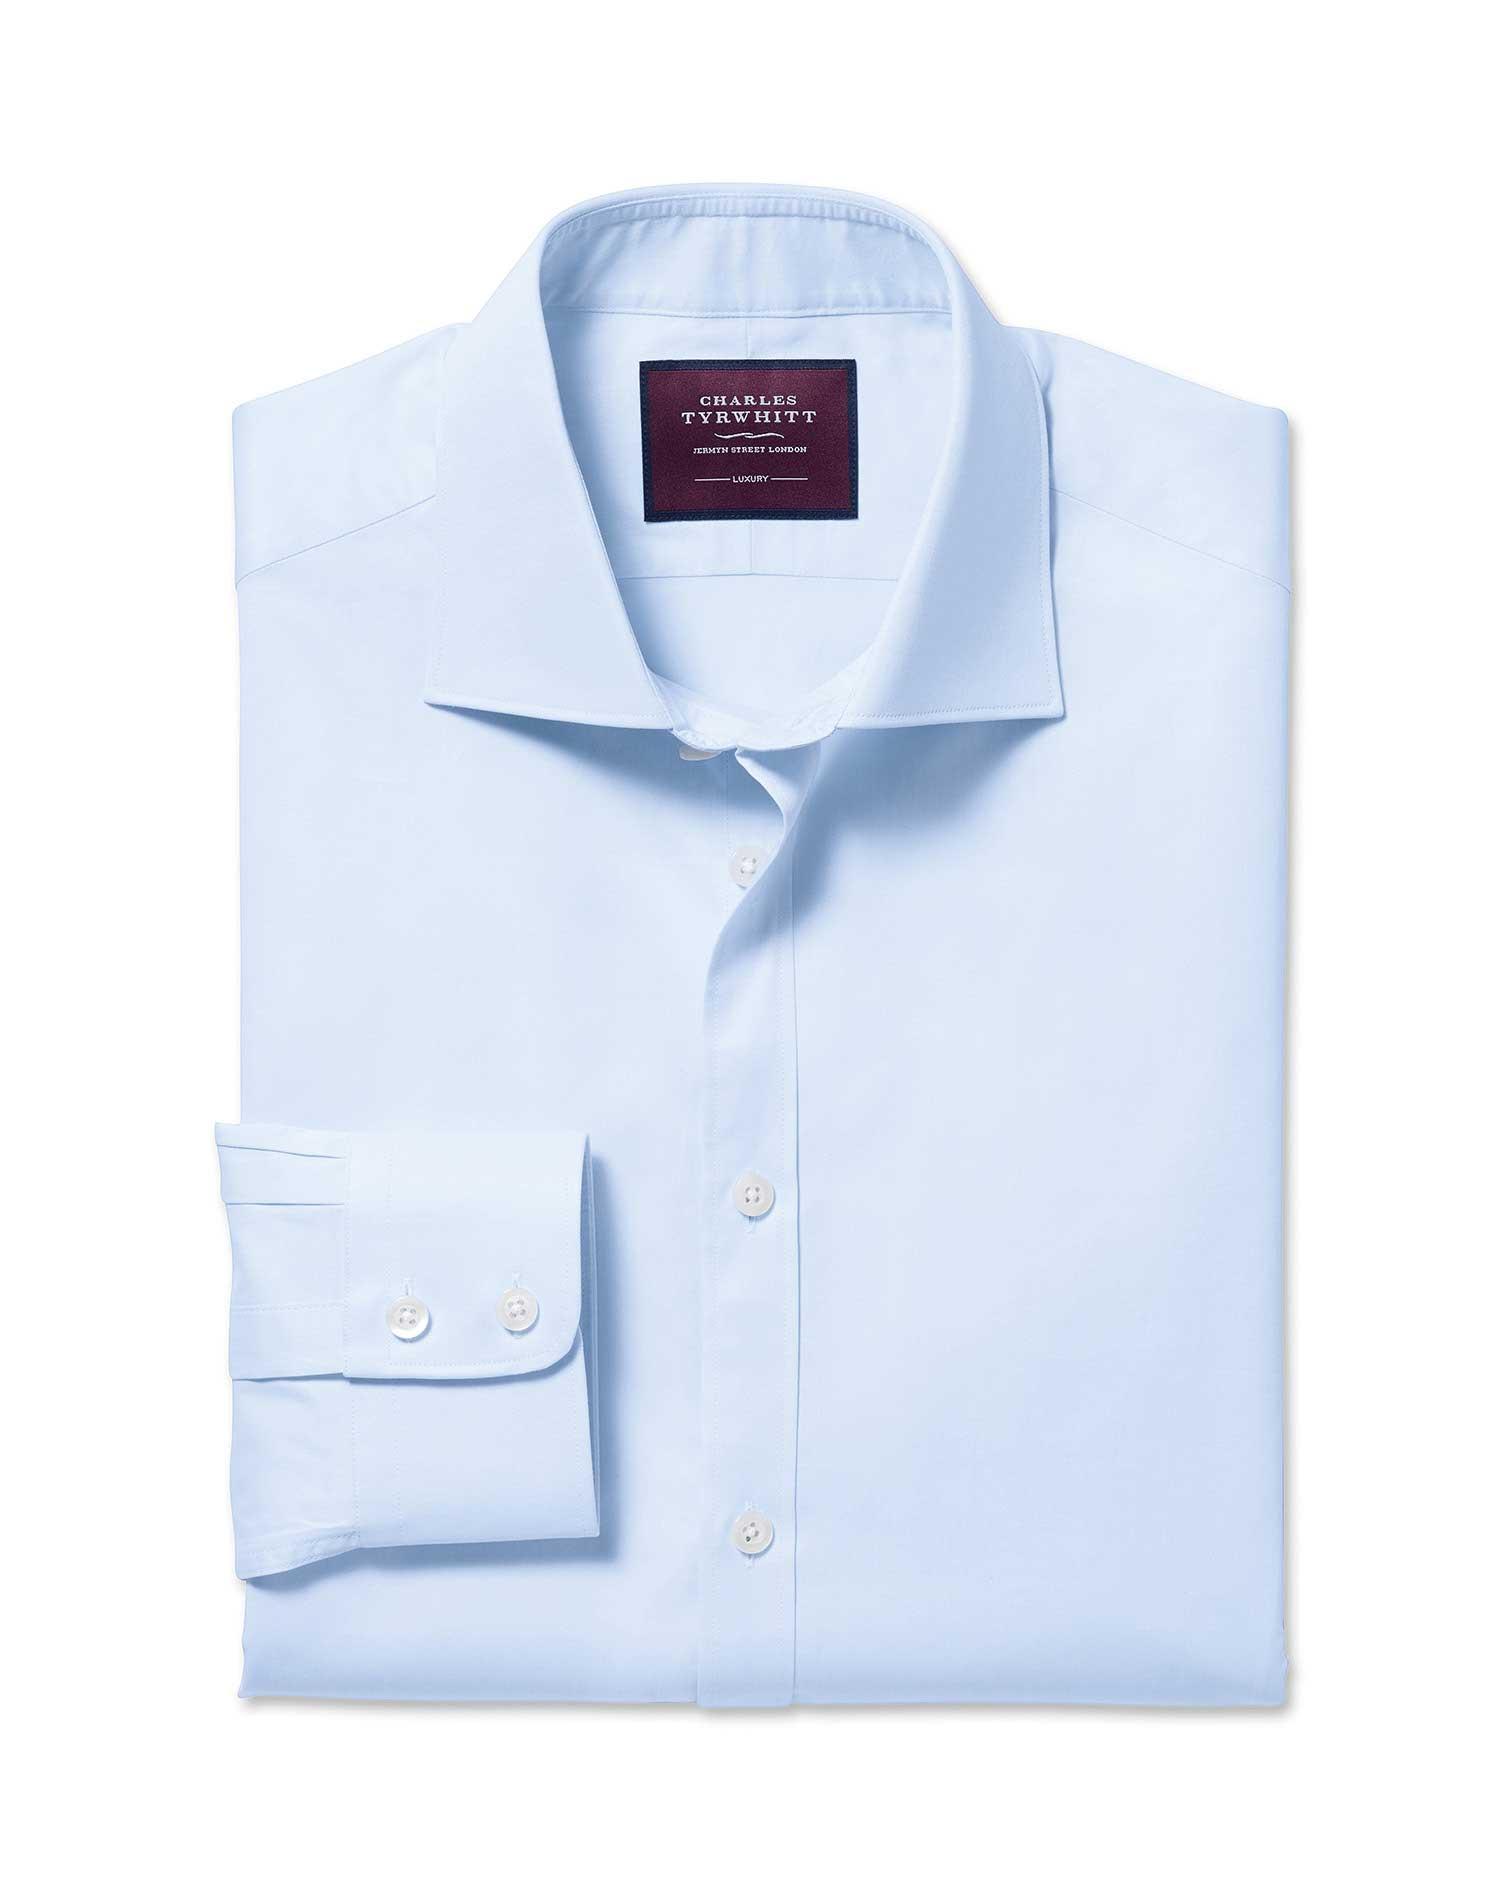 Extra Slim Fit Semi-Cutaway Luxury Twill Light Blue Egyptian Cotton Formal Shirt Single Cuff Size 16